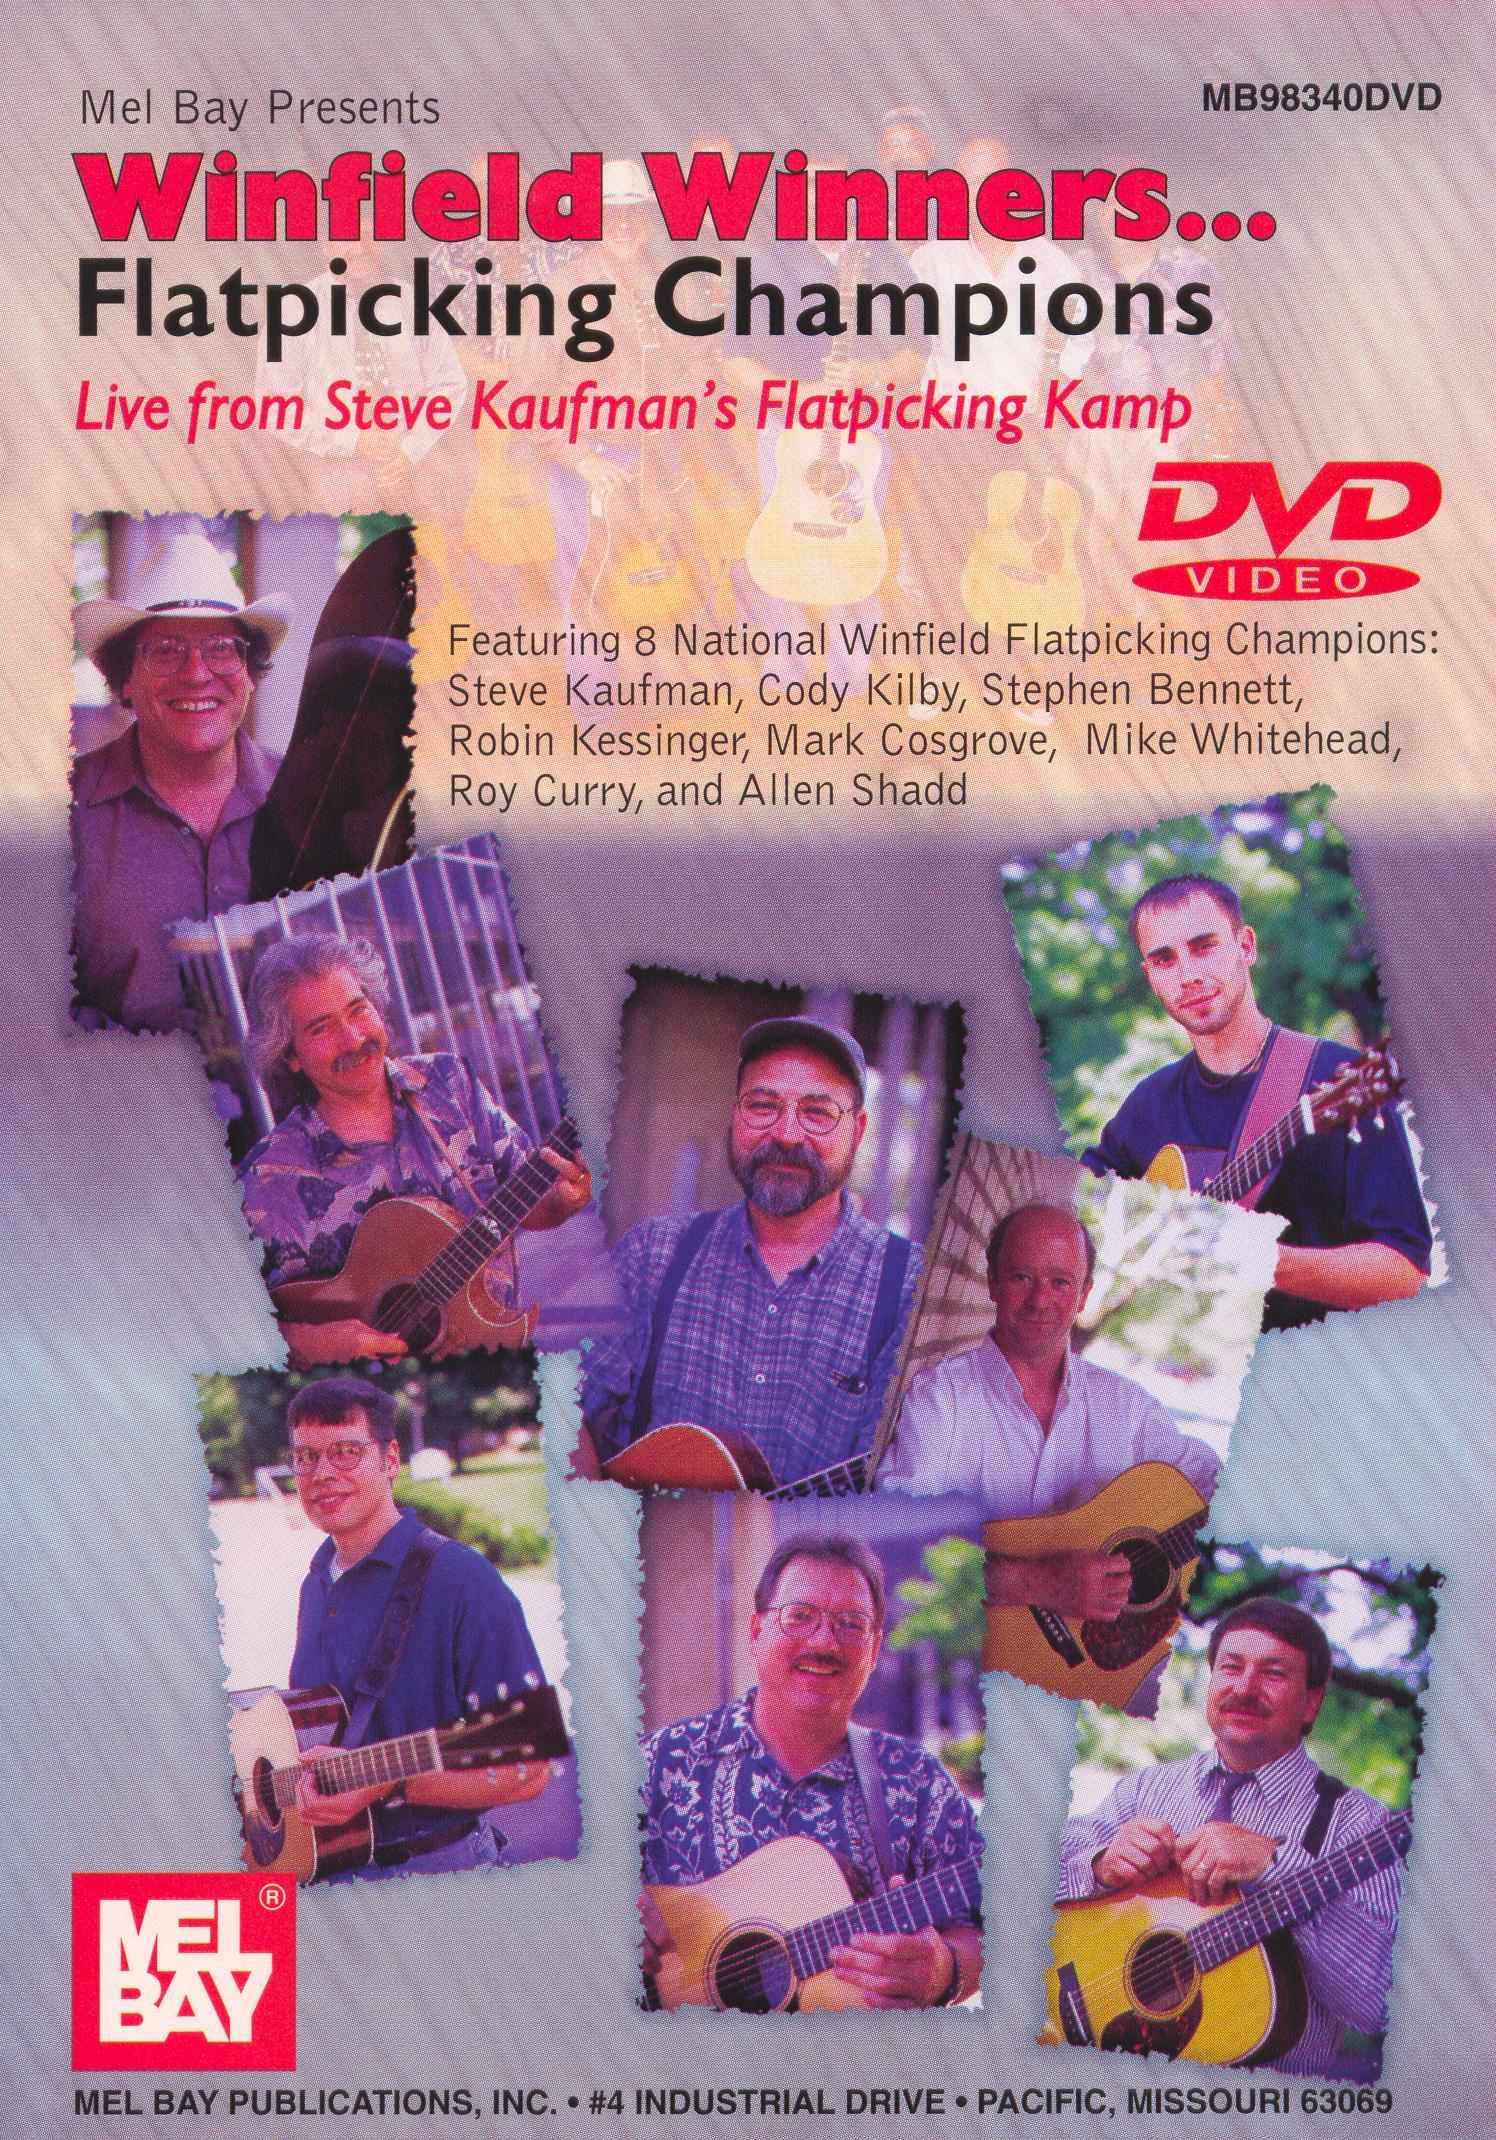 Winfield Winners: Flatpicking Champions Live from Steve Kaufman's Flatpicking Kamp